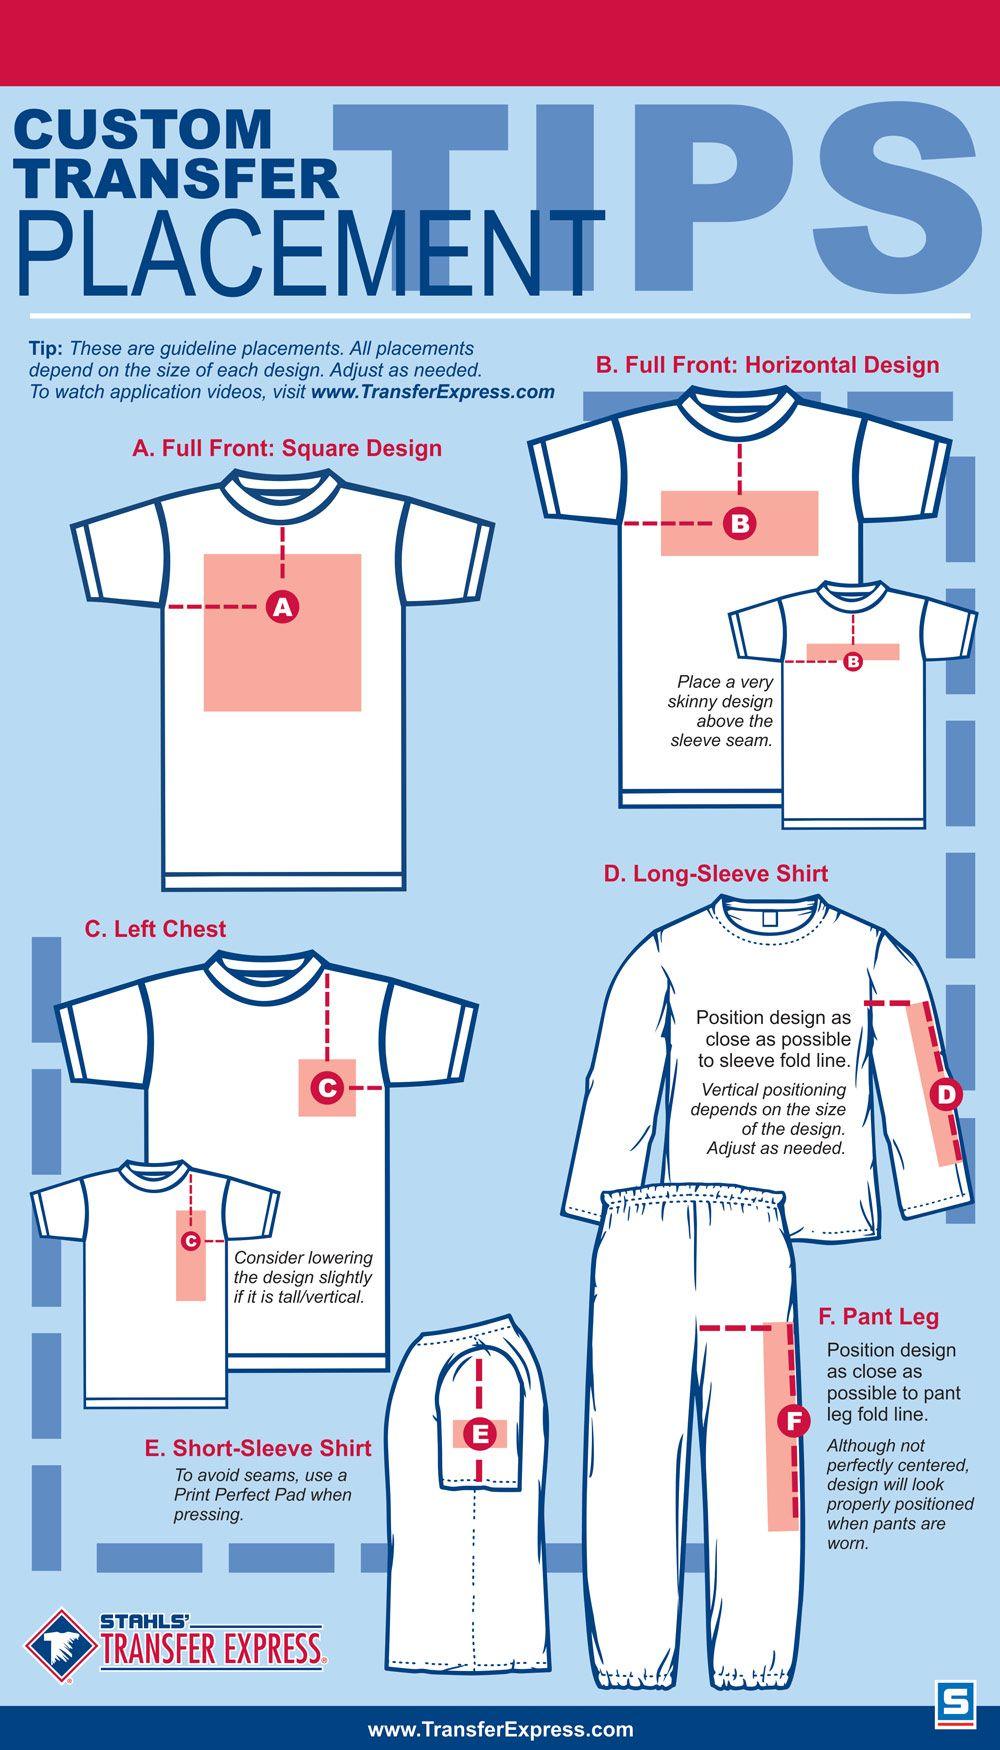 Download Tips For Design Image Placement When Customizing Apparel Custom Apparel Infographic Transferexpress Com Cricut Projects Vinyl Cricut Tutorials Diy Cricut